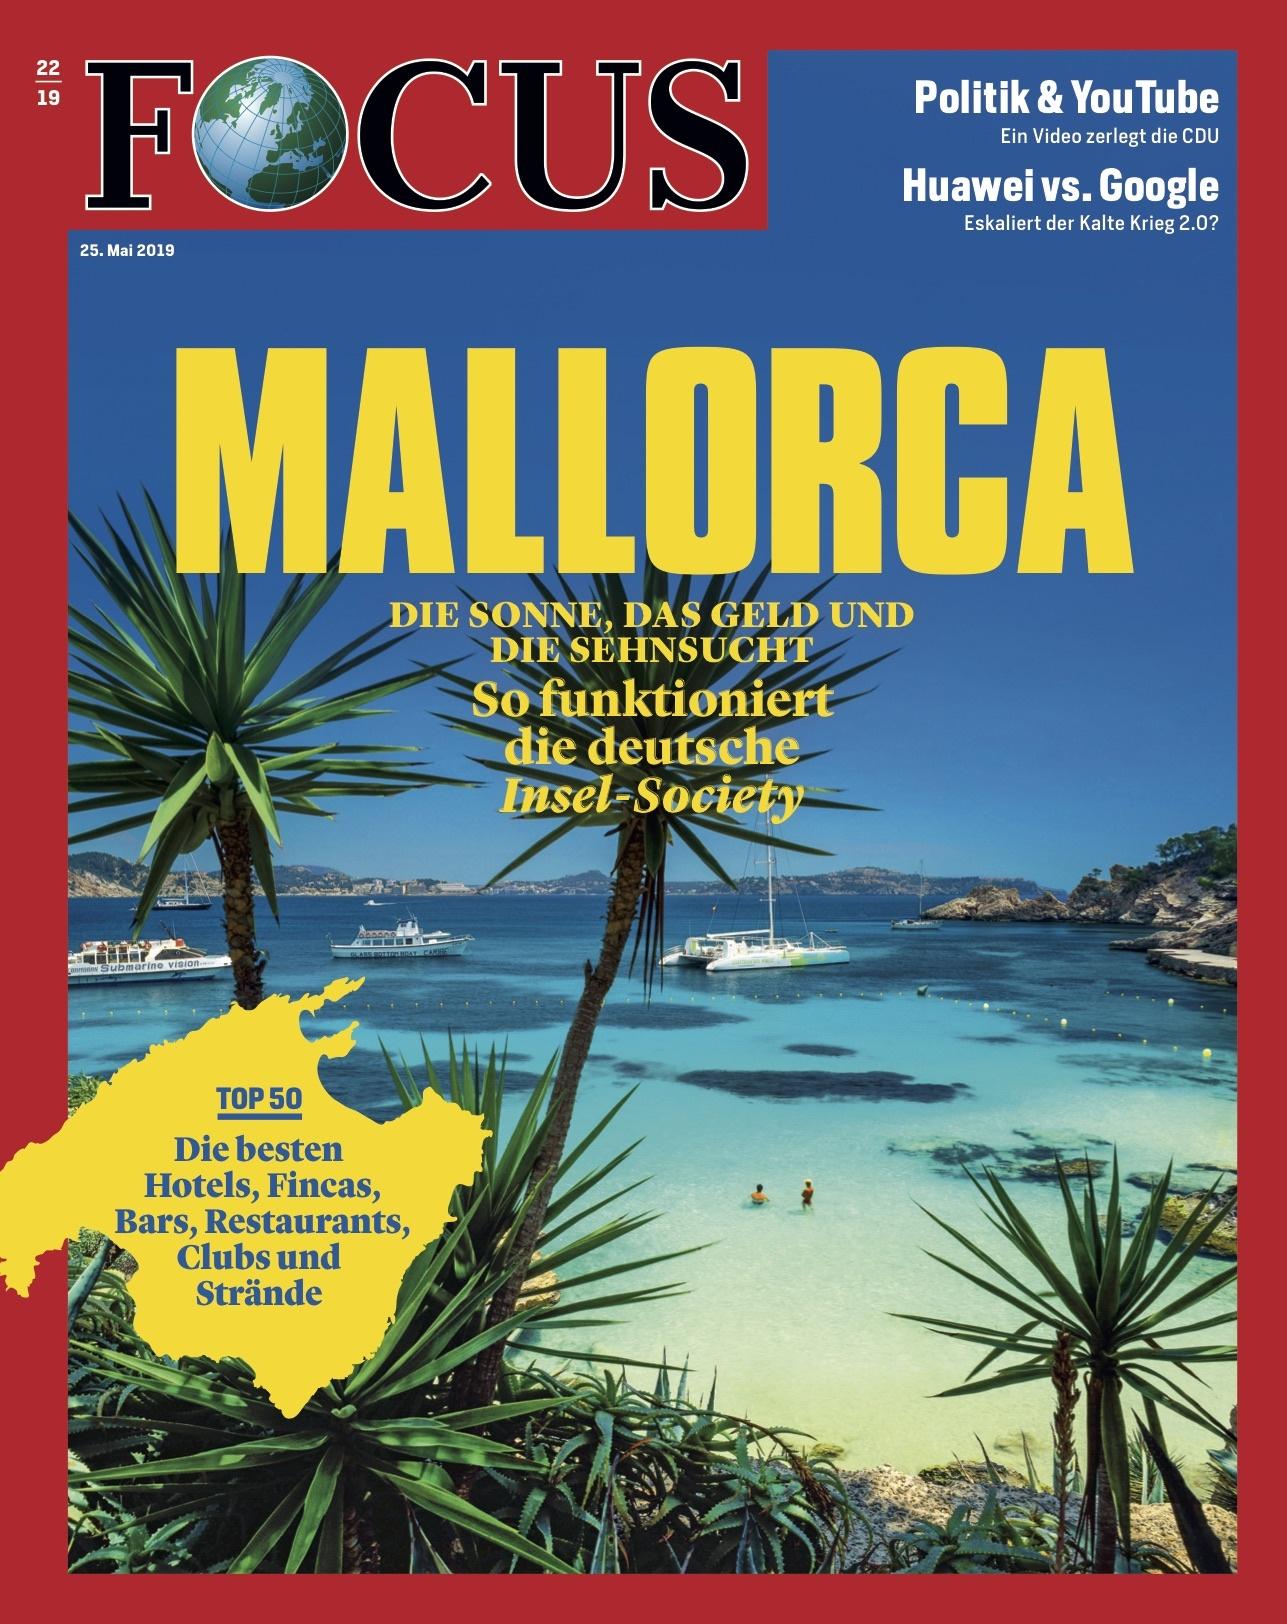 FOCUS Magazin FOCUS Magazin - Mallorca